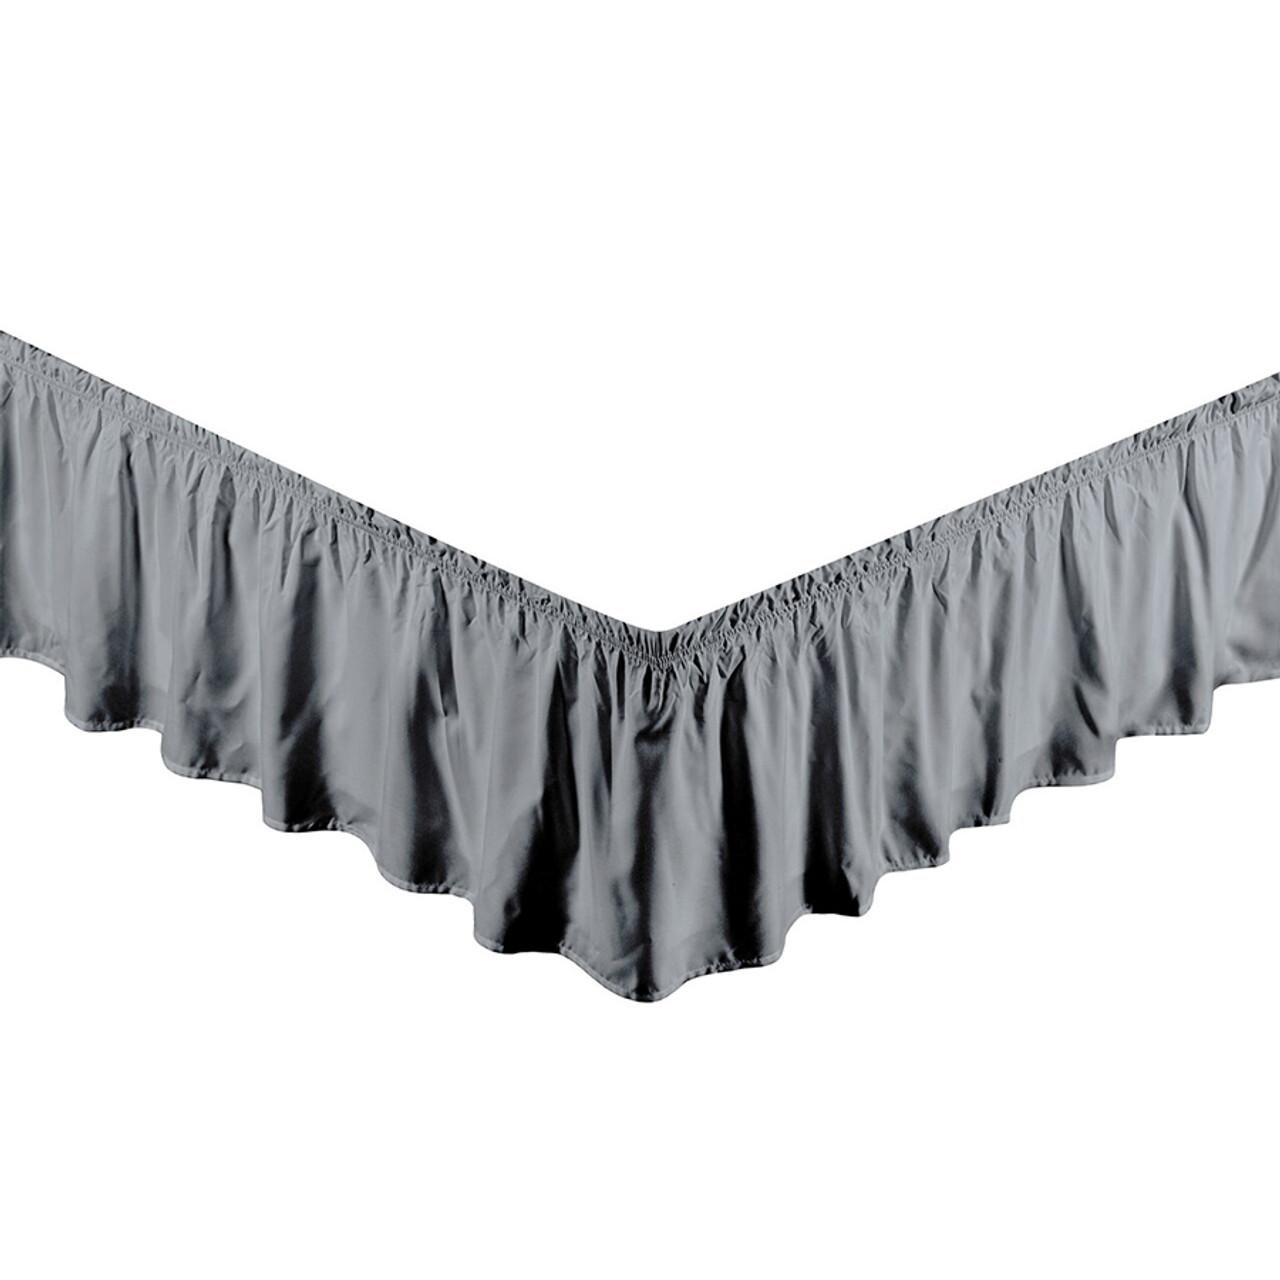 "Grey Bed Skirt Dust Ruffle 100% Brushed Microfiber with 14"" Drop in USA, California, New York, New York City, Los Angeles, San Francisco, Pennsylvania, Washington DC, Virginia, Maryland"